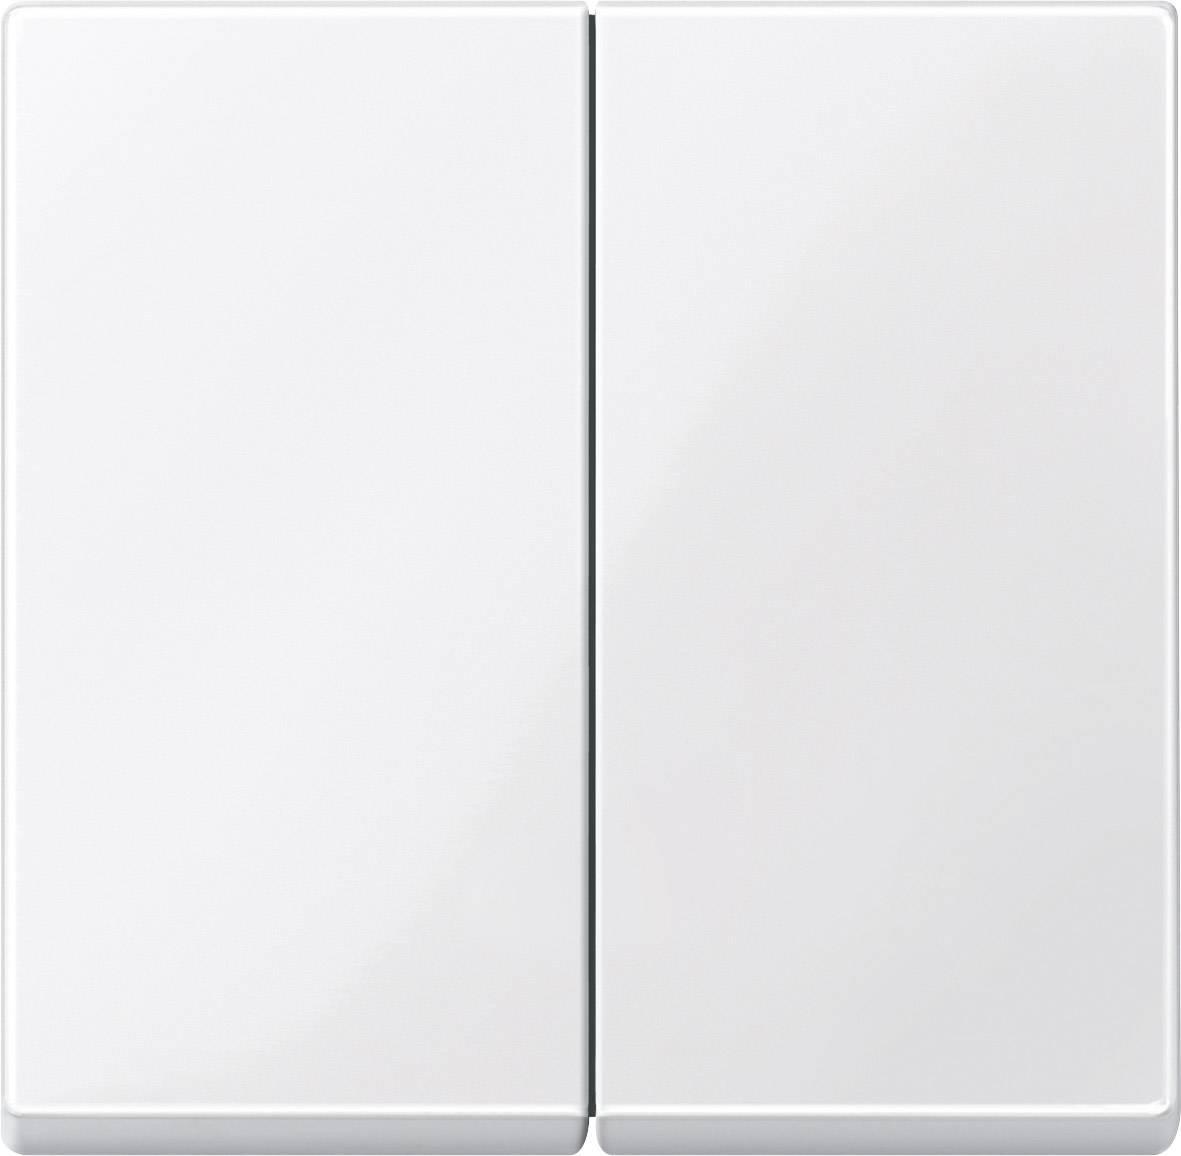 Kryt sériového spínače do krabičky Merten, polární bílá (432519)